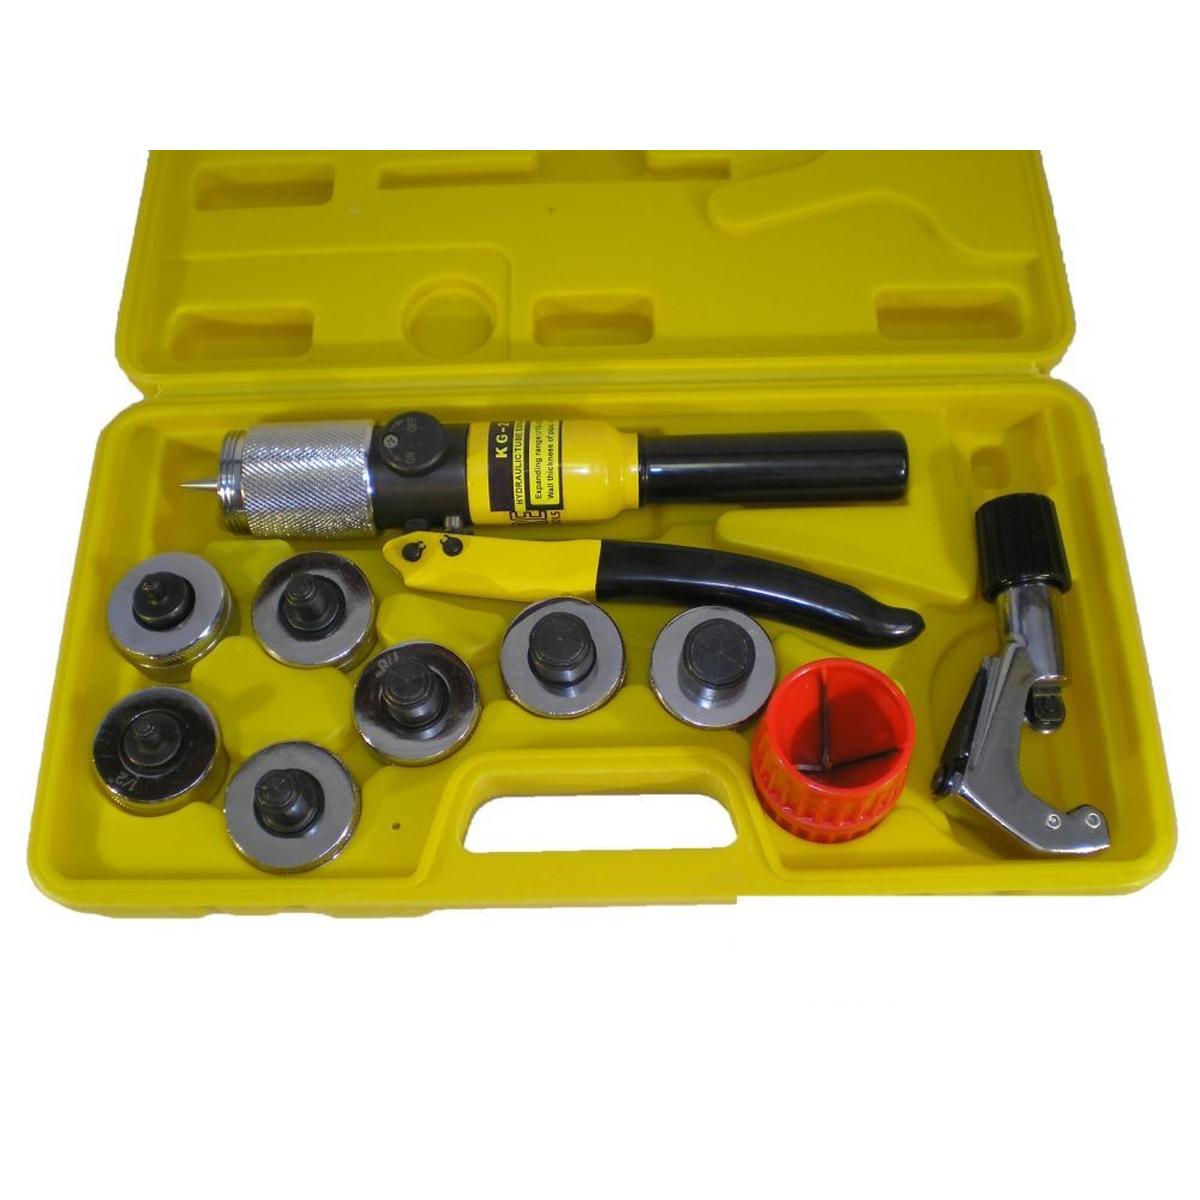 Hidraulikus csőtágító (10-28mm) (KG-28)